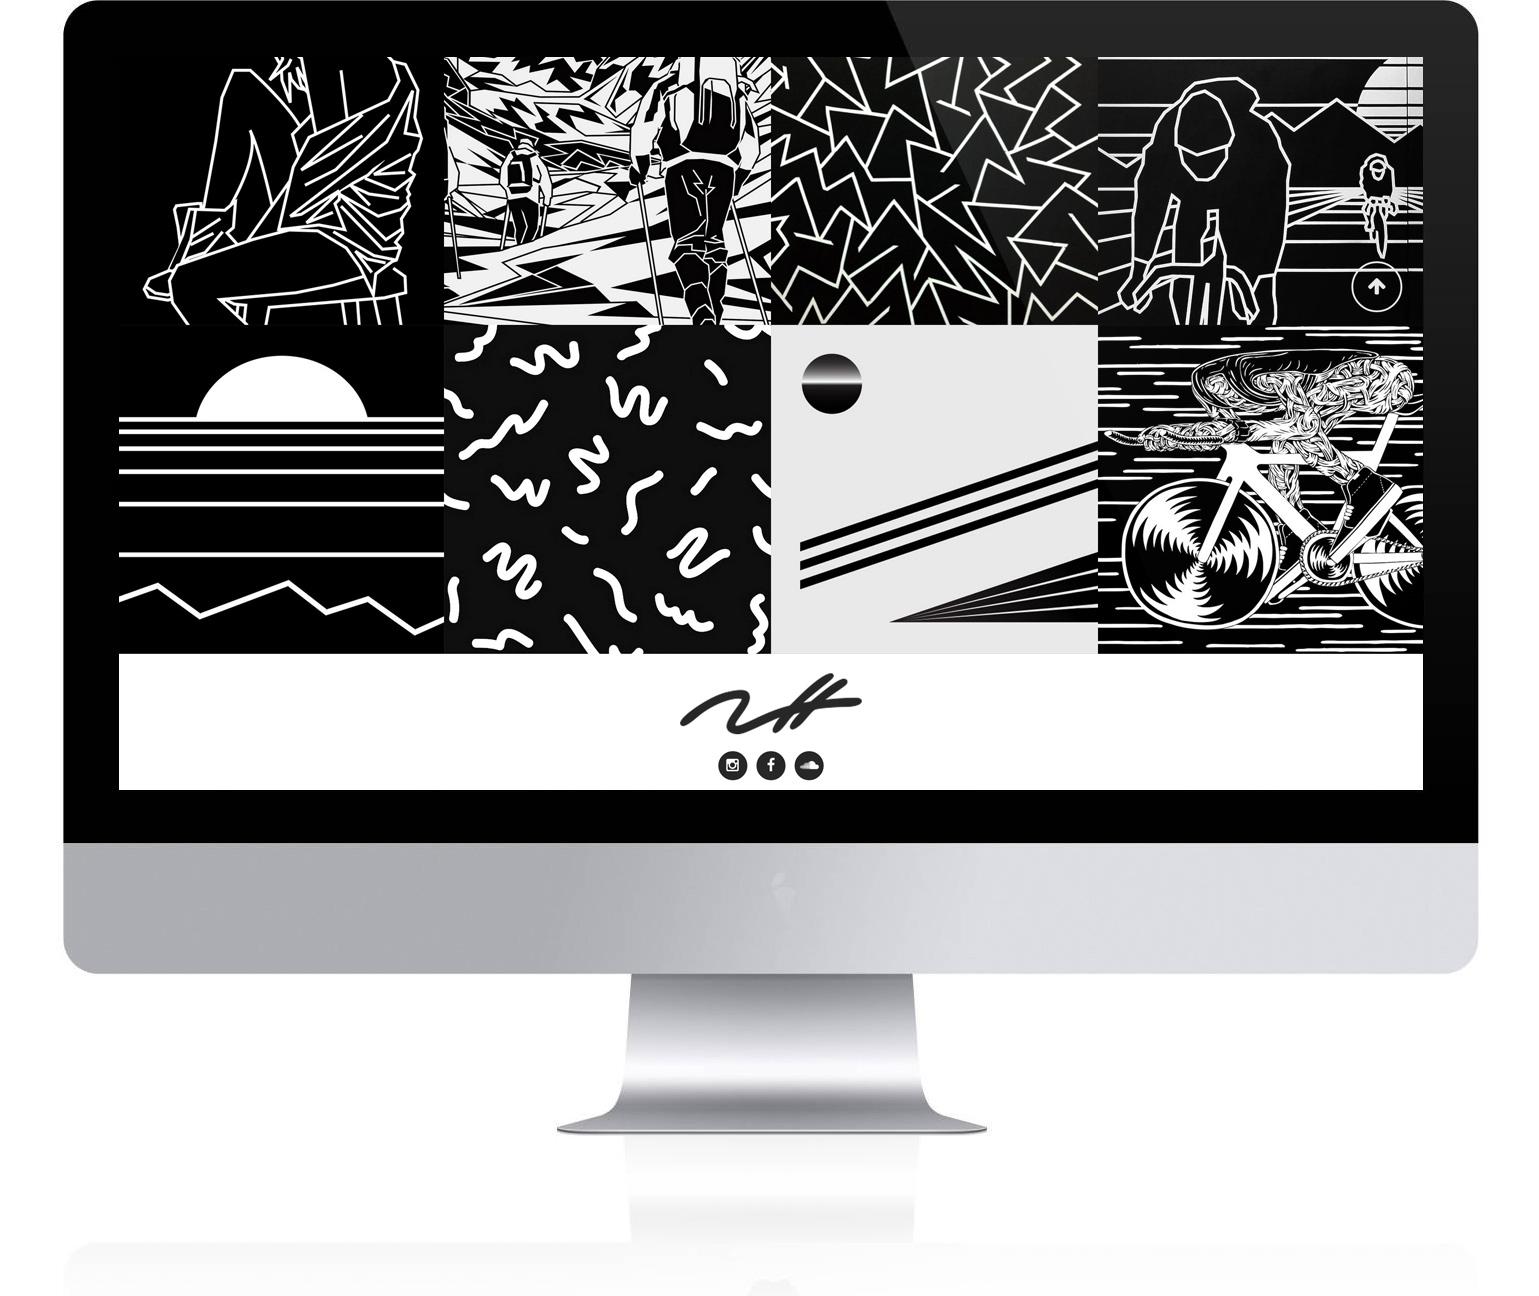 Uglyfresh-Mac-Screen-02.jpg